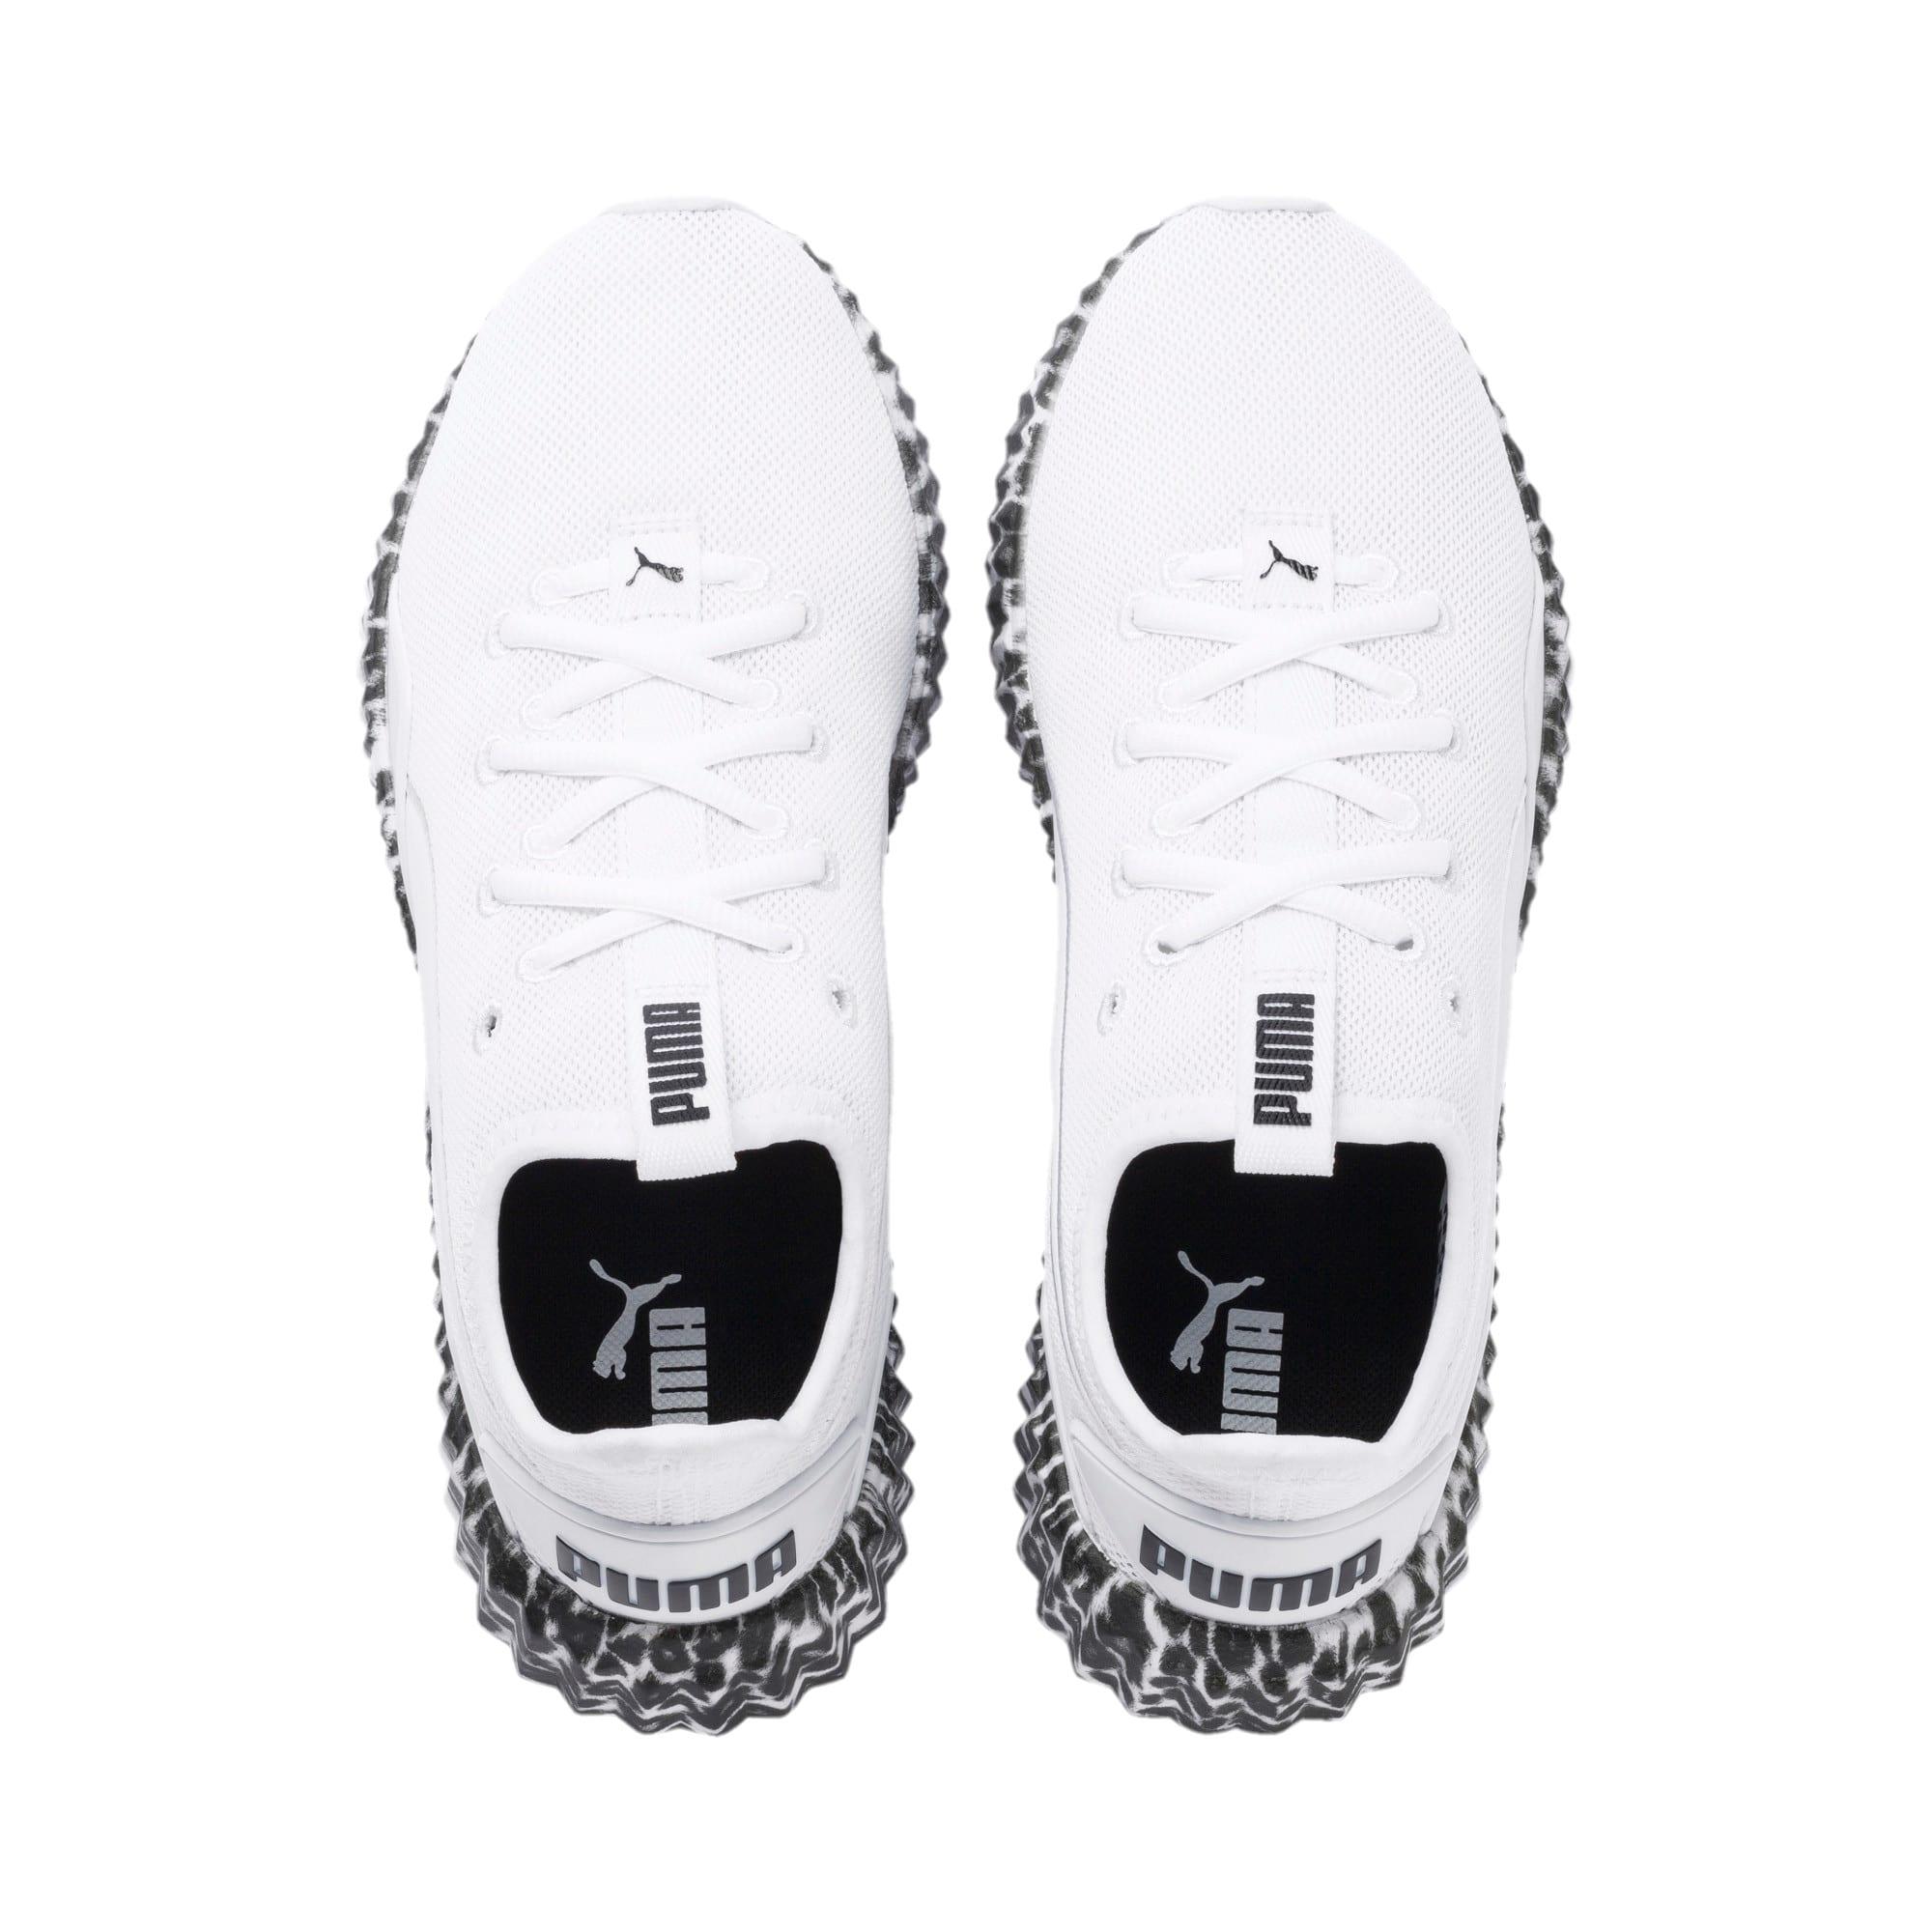 Thumbnail 7 of Defy Leopard Women's Sneakers, Puma White-Puma Black, medium